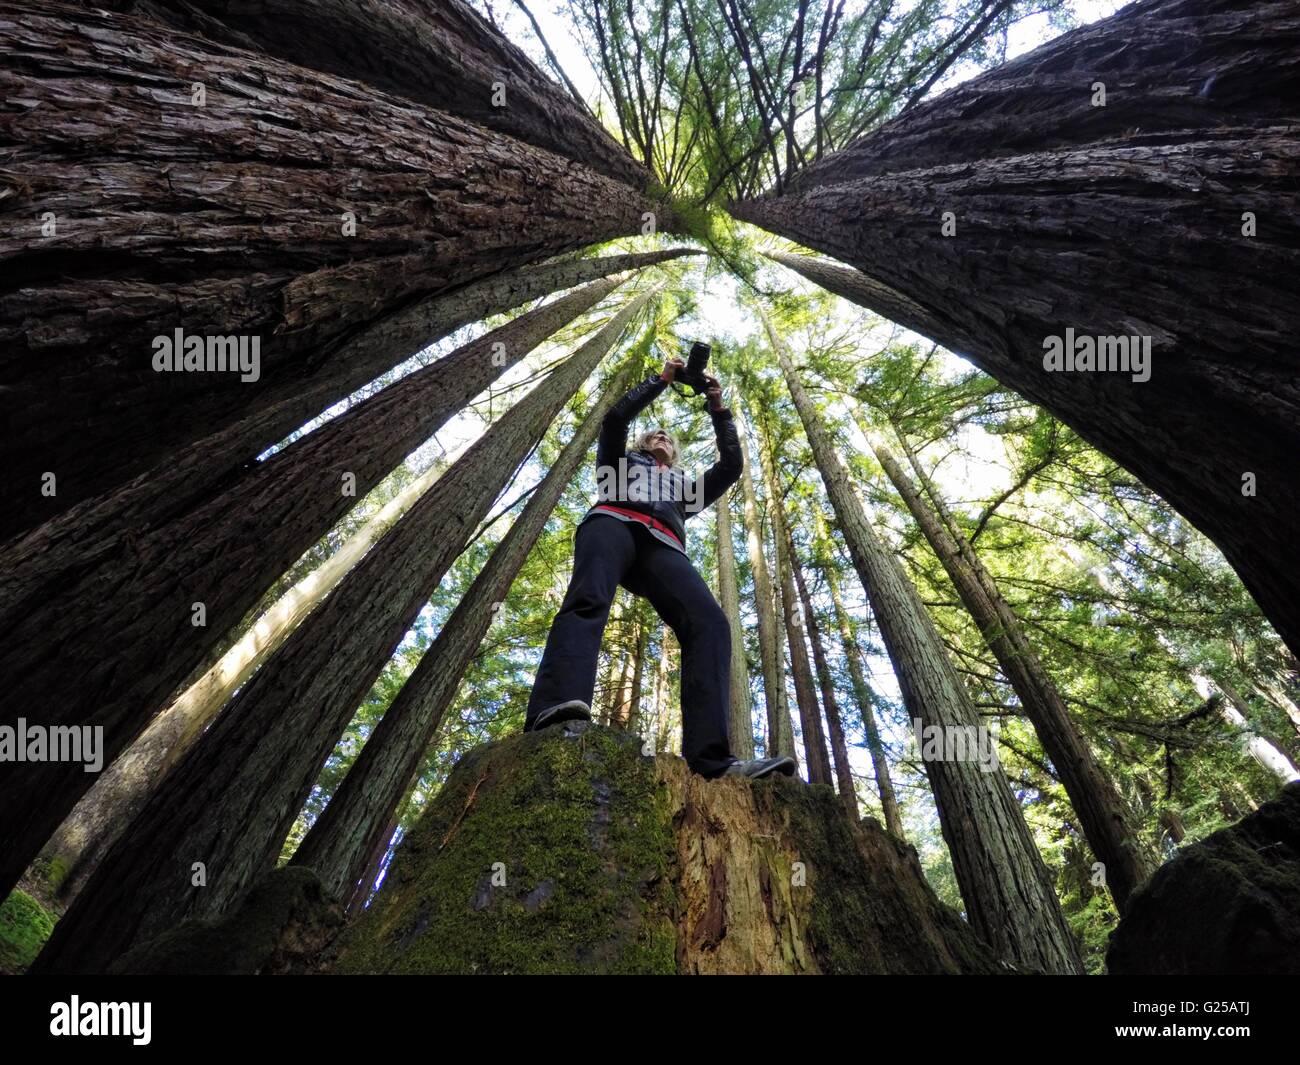 Frau fotografieren Redwood Bäume, California, Amerika, USA Stockfoto